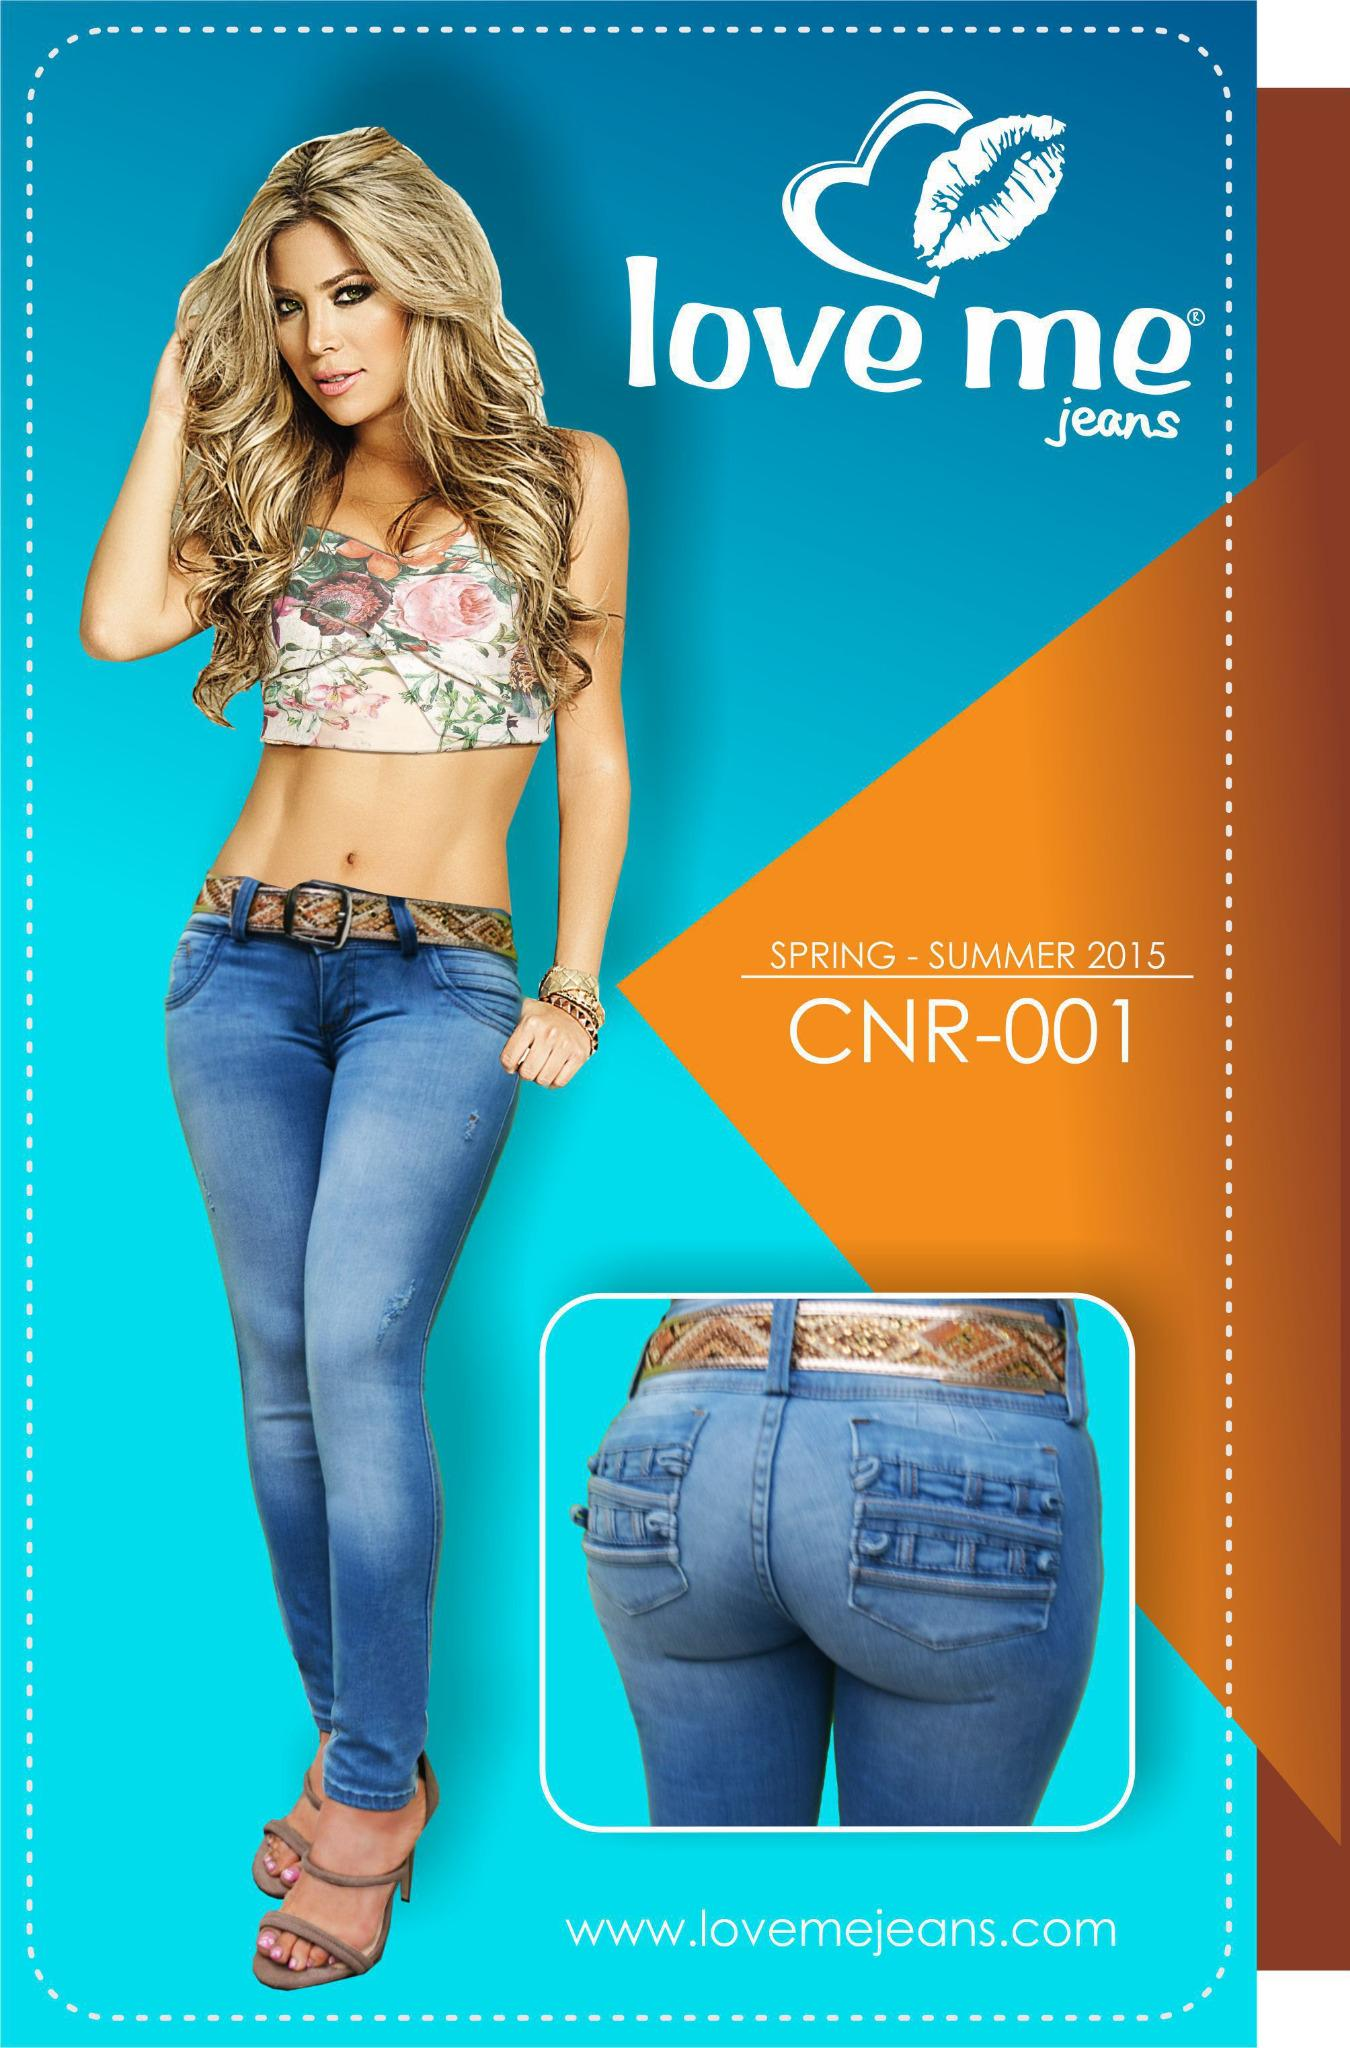 Love Me Jeans On Twitter Encuentra Estas Referencias En C C Gran San Local 2188 Http T Co Gid3zwk8c6